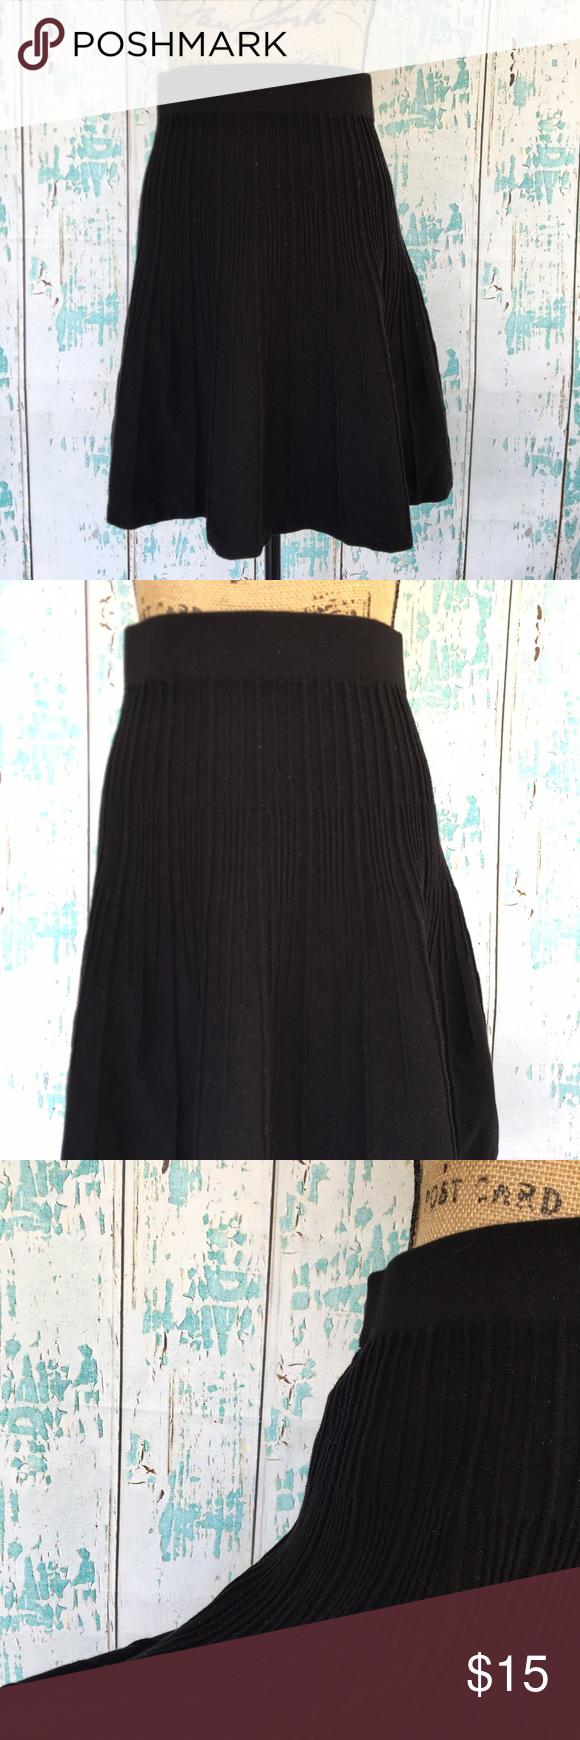 Cabi black cotton rubbed A line skirt size medium Cabi black cotton rubbed A line skaterskirt size medium CAbi Skirts Circle & Skater